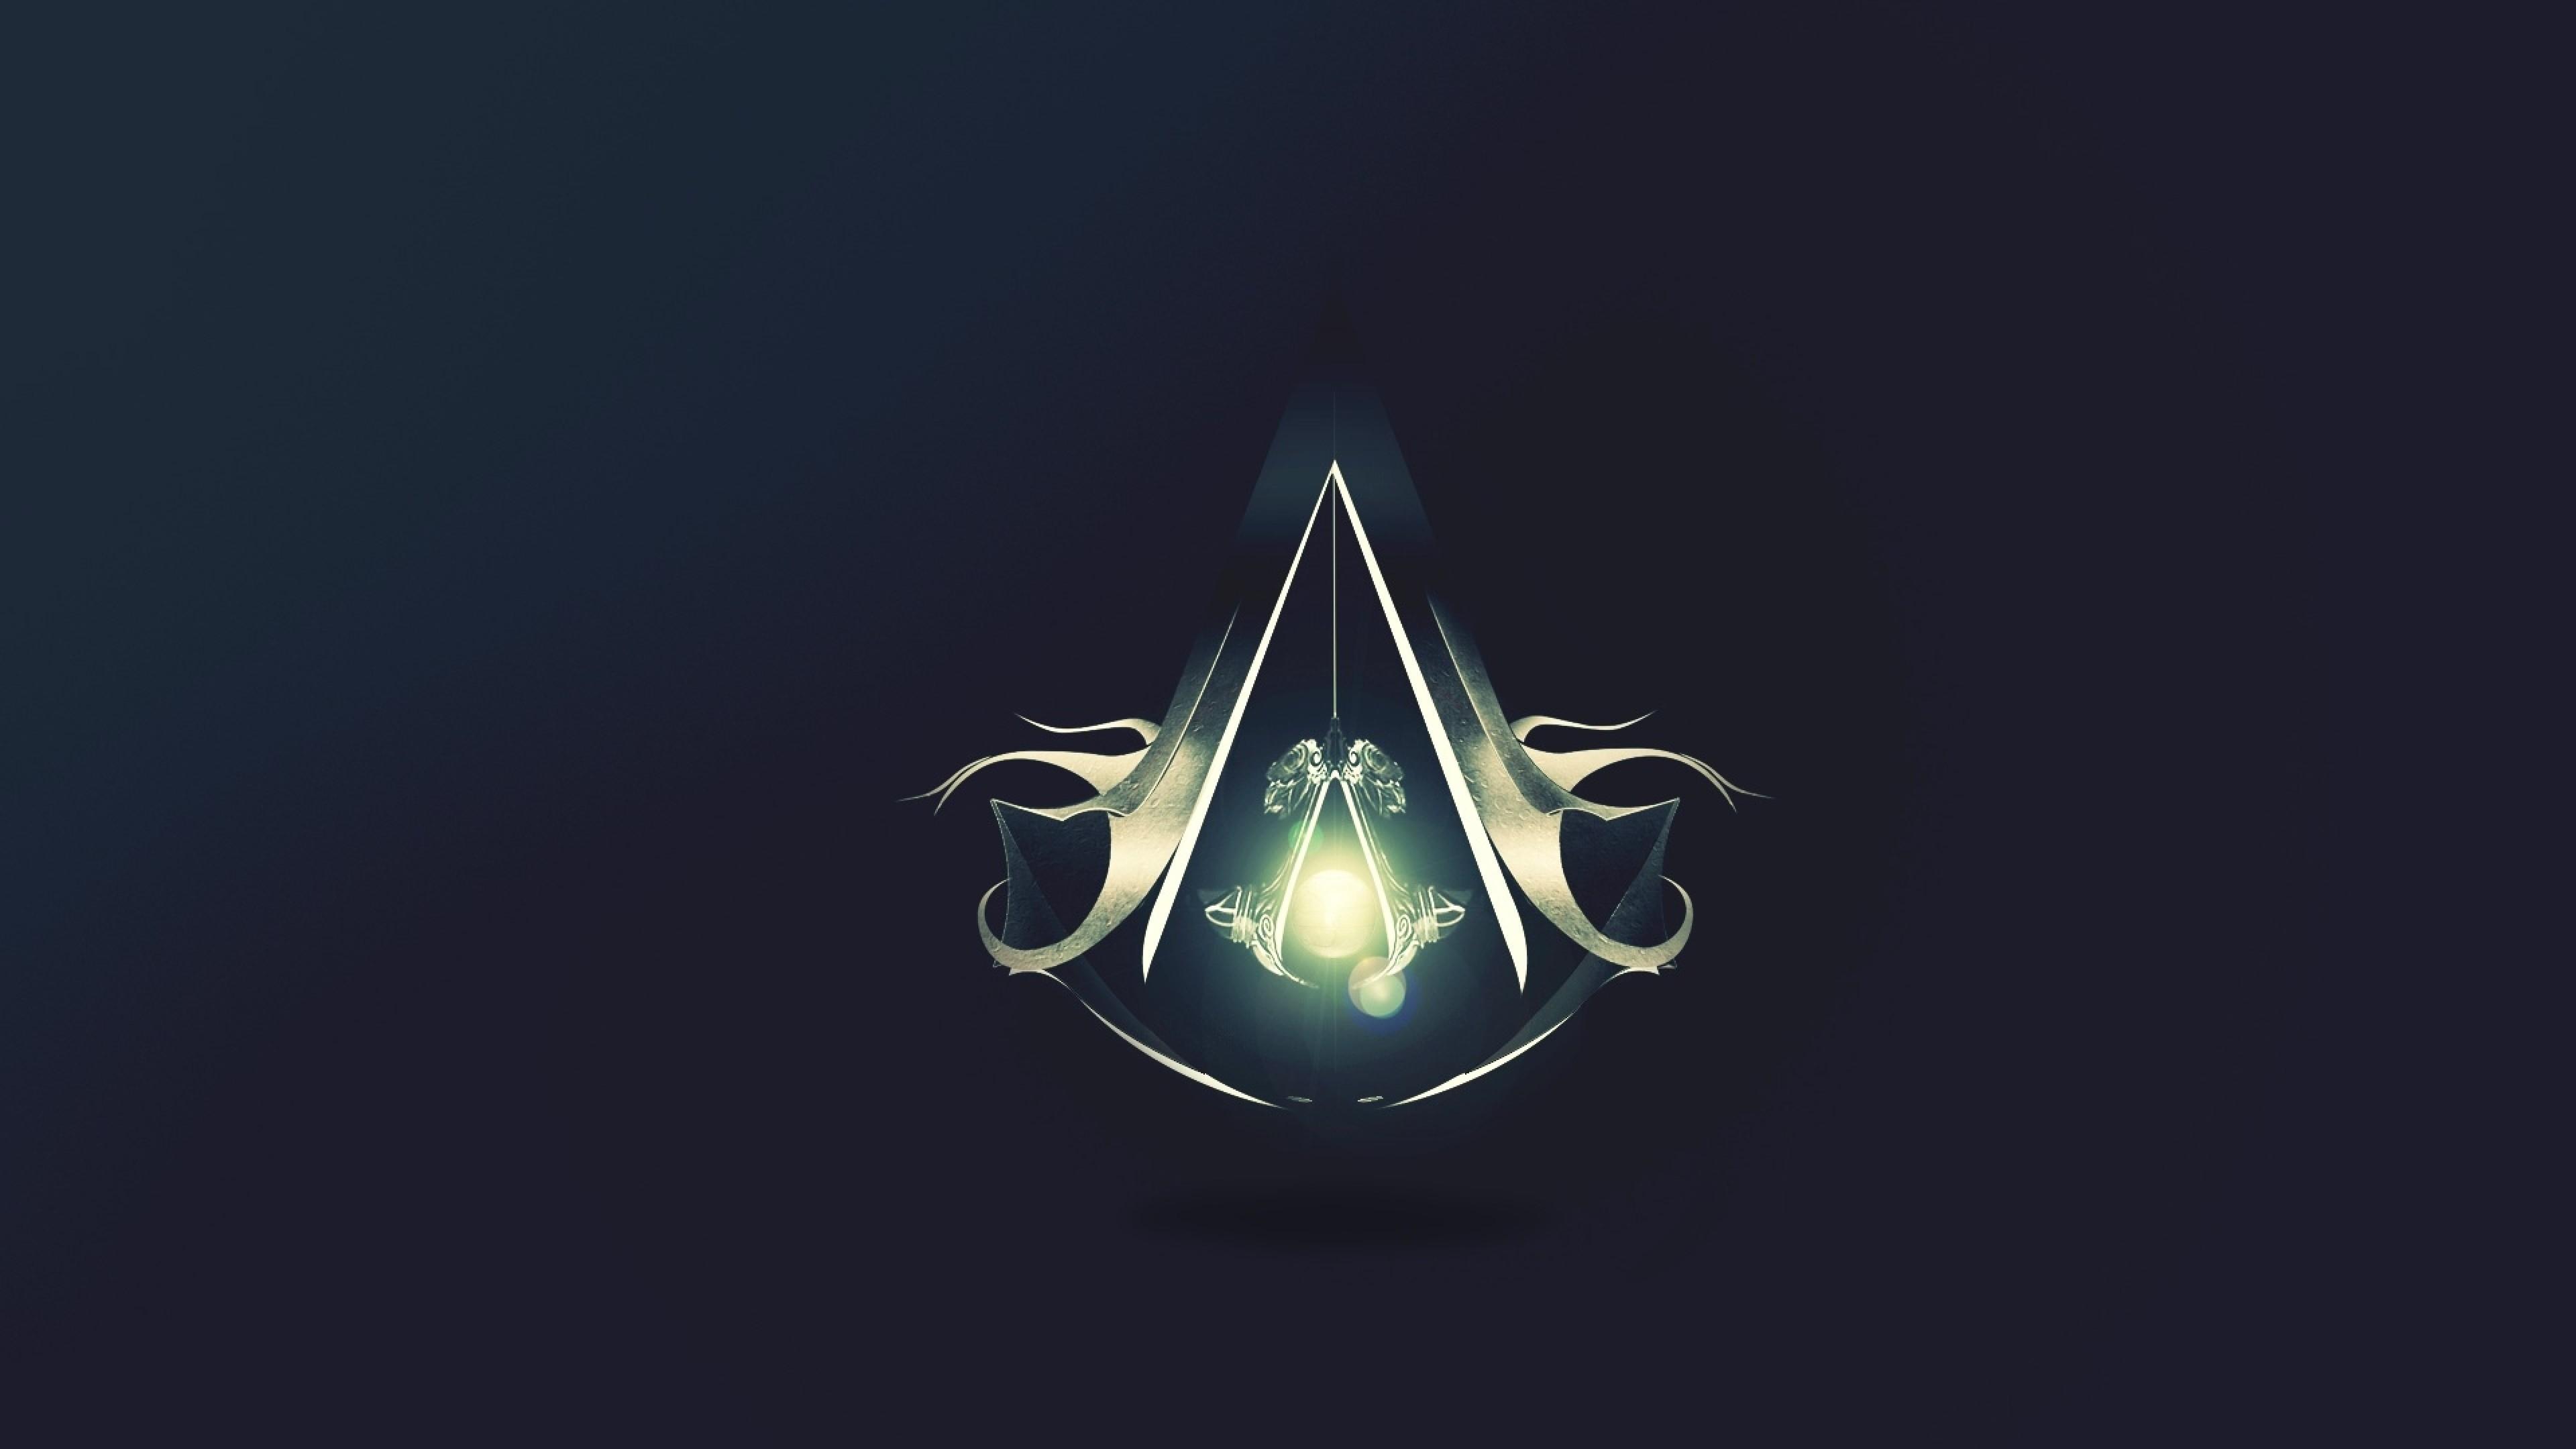 Preview wallpaper assassins creed revelations, assassins symbol, graphics,  light, background 3840×2160